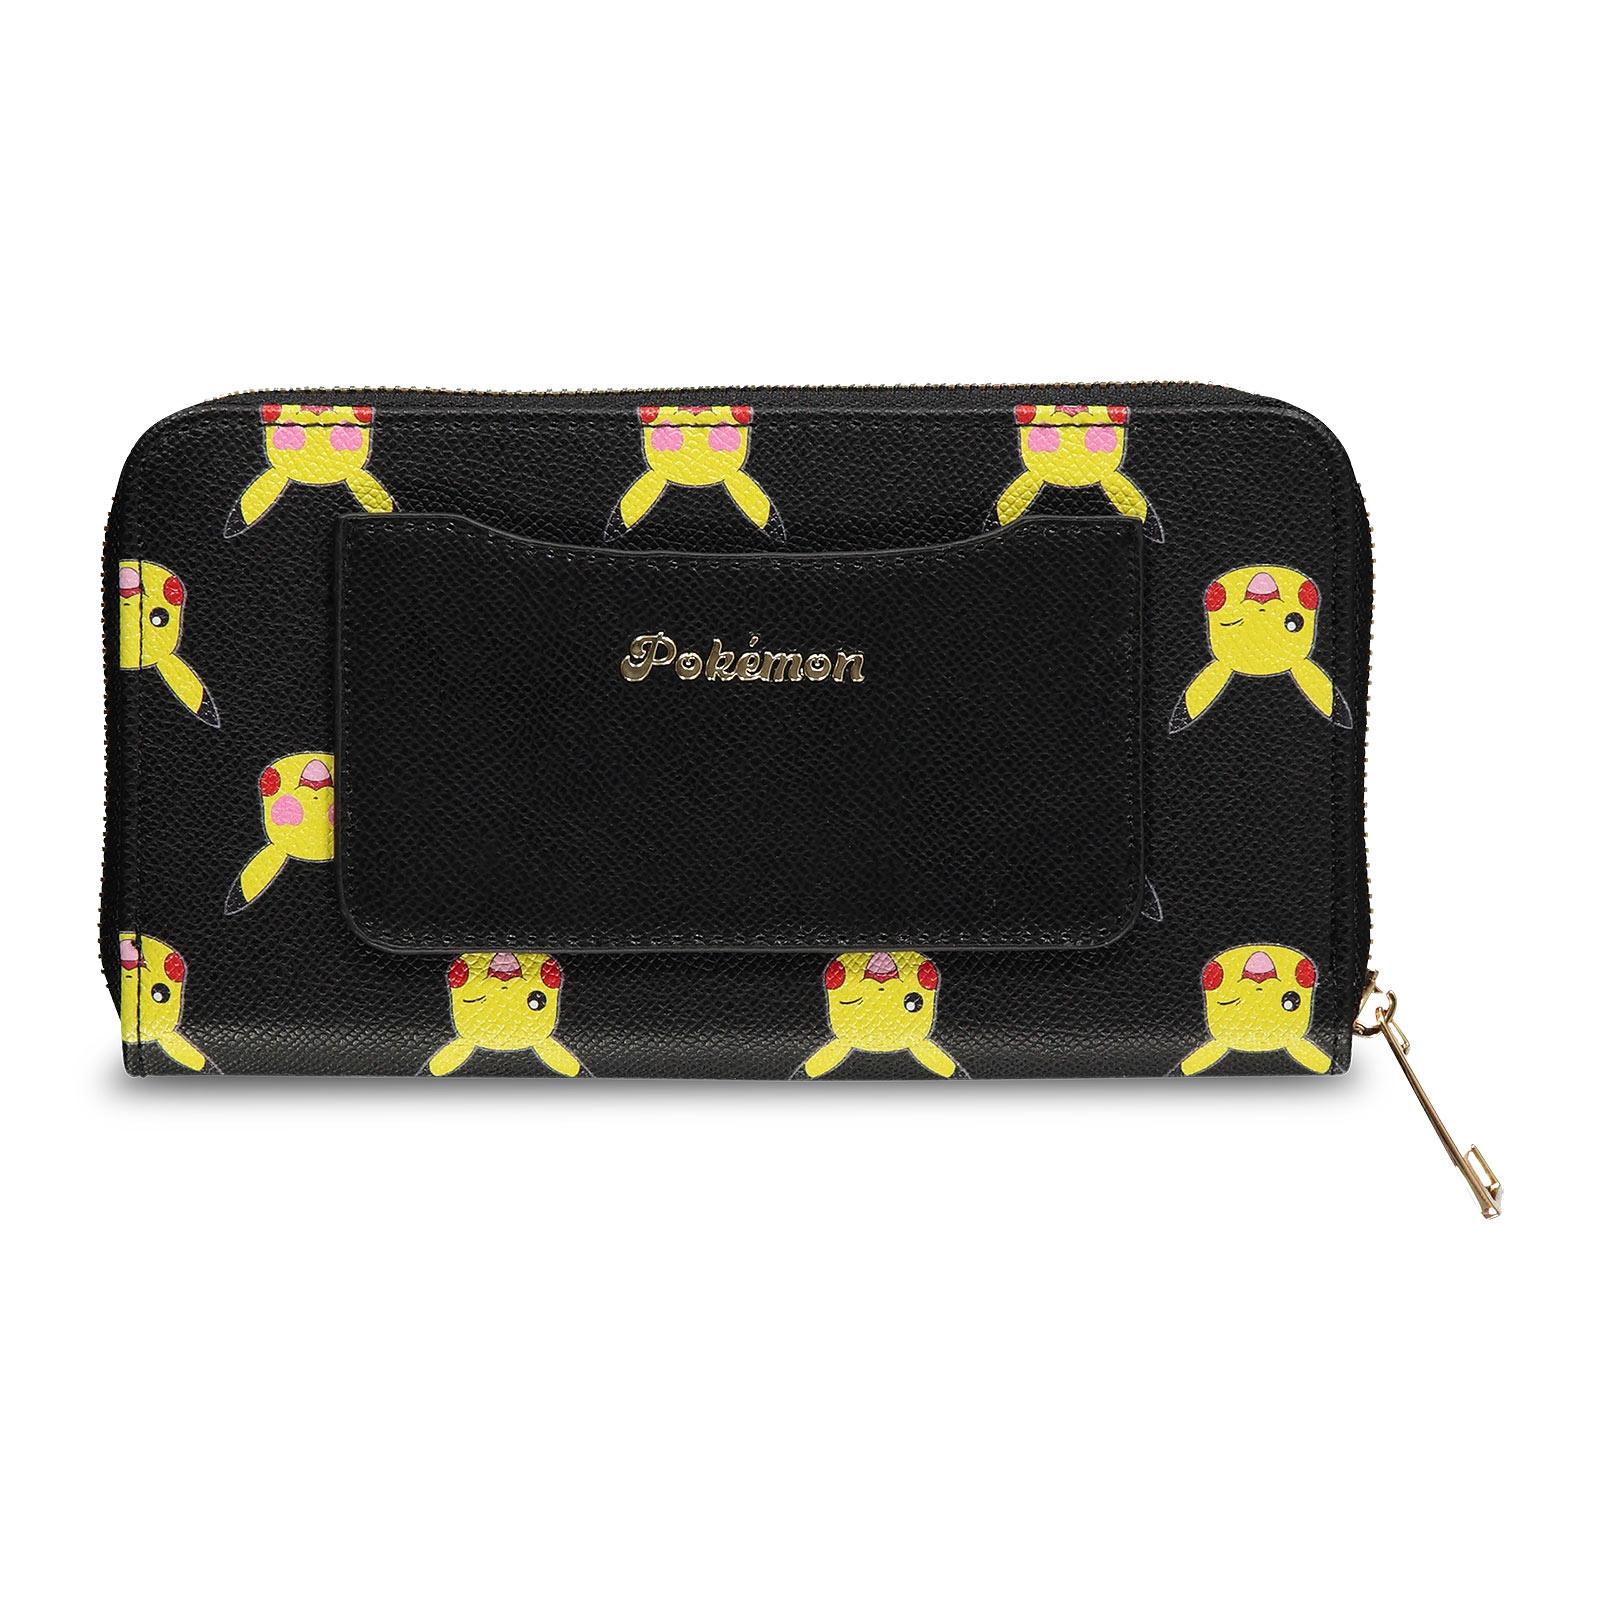 Pokemon - Pikachu Emotes Geldbörse